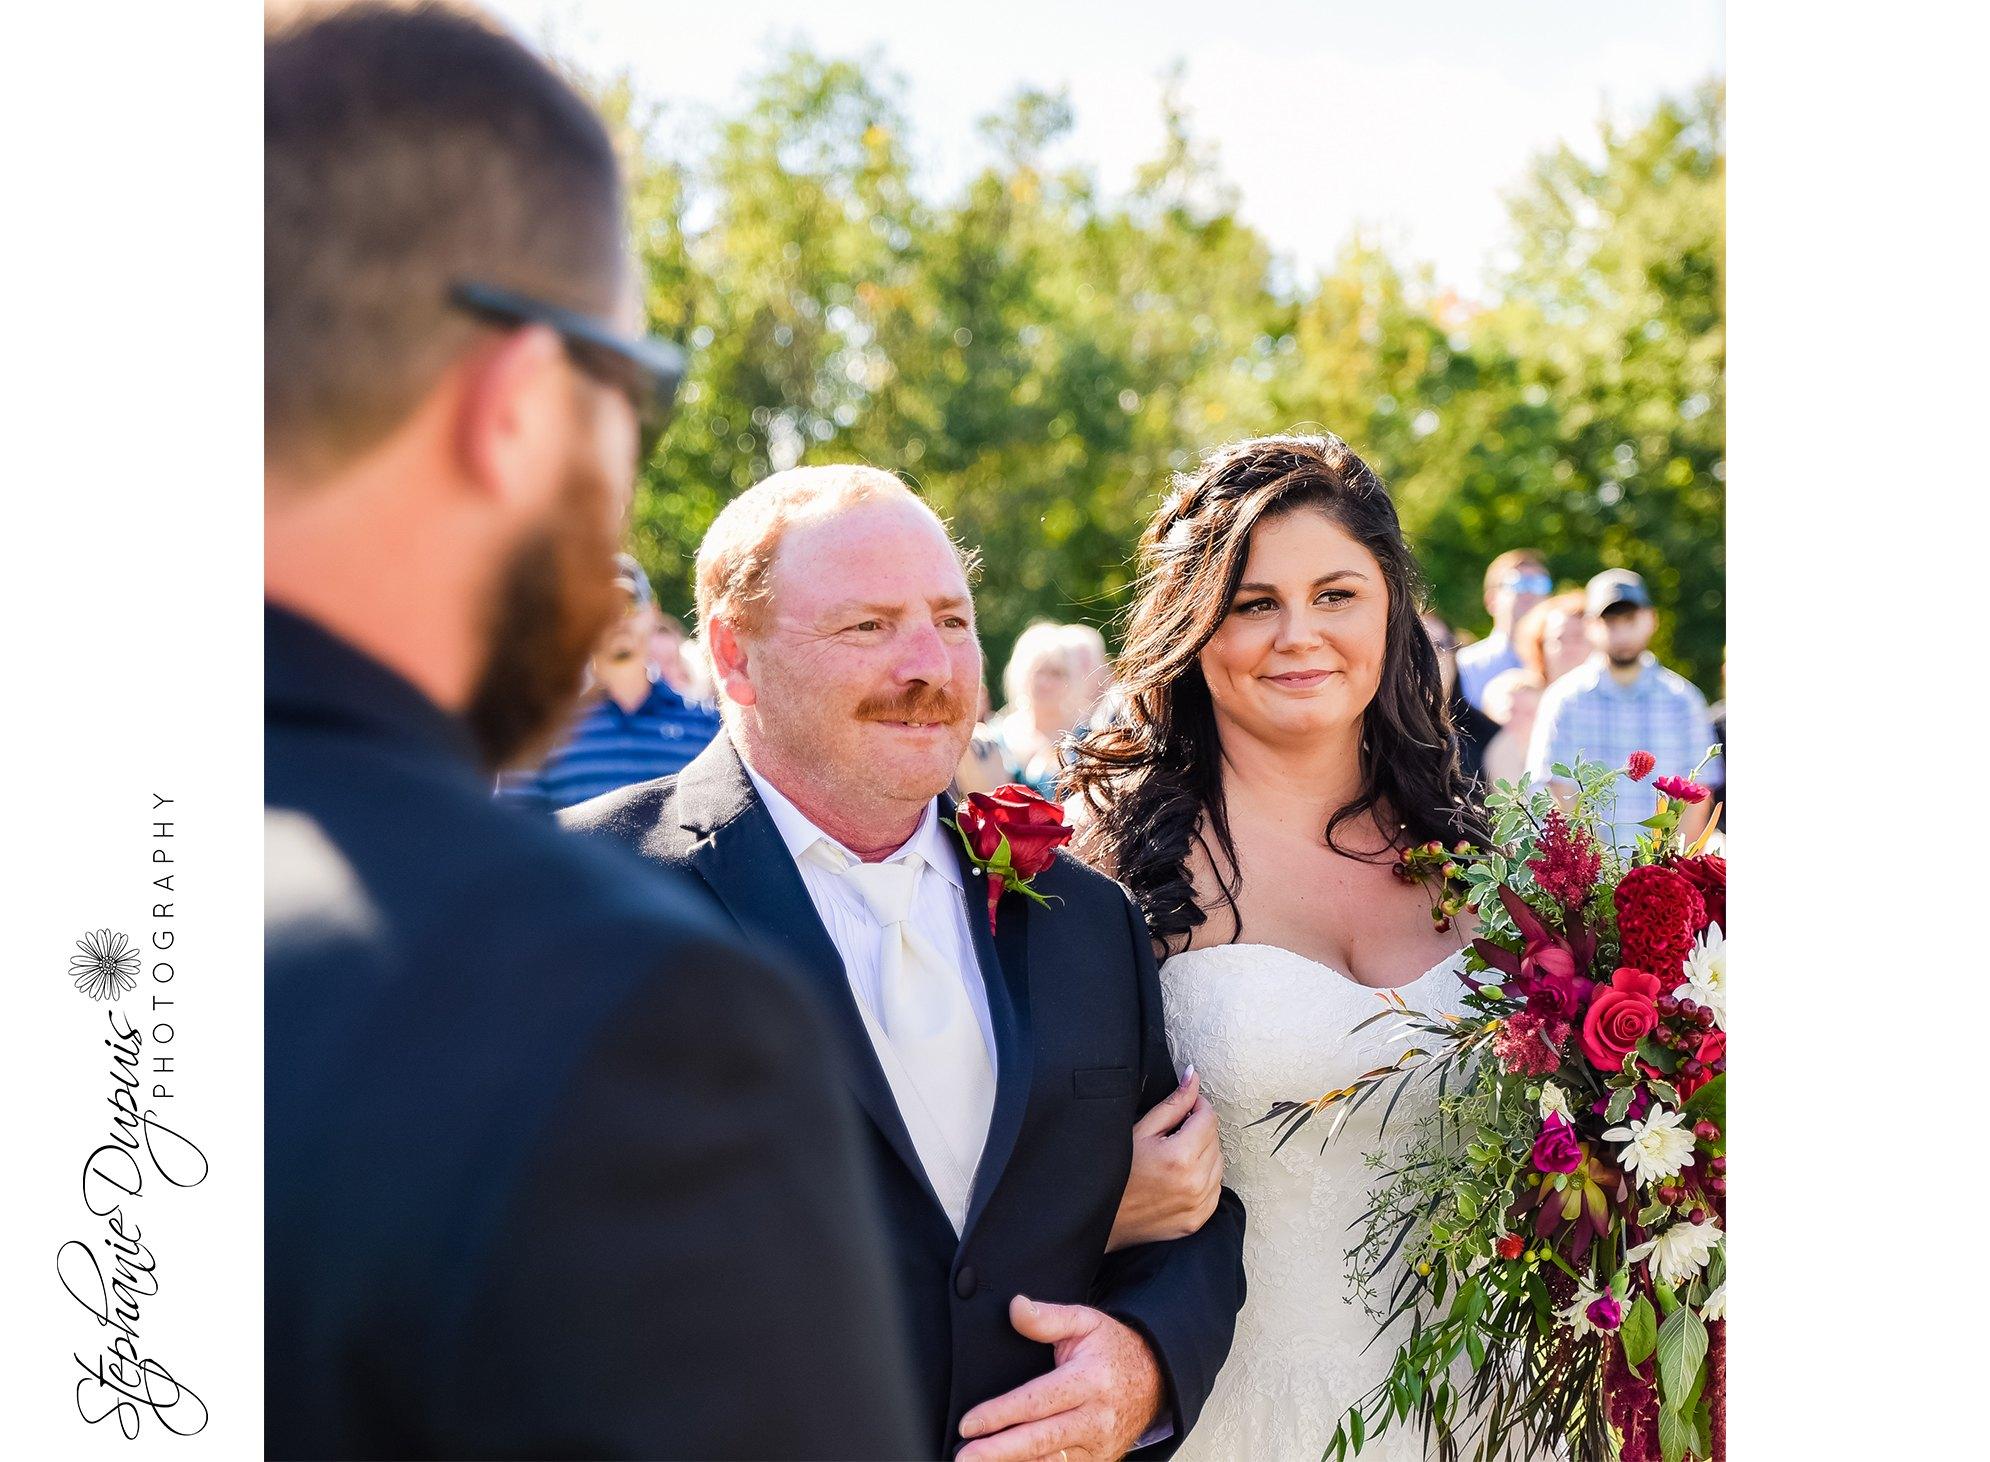 Lancaster Wedding Photographer 05 - Portfolio: Brown Wedding